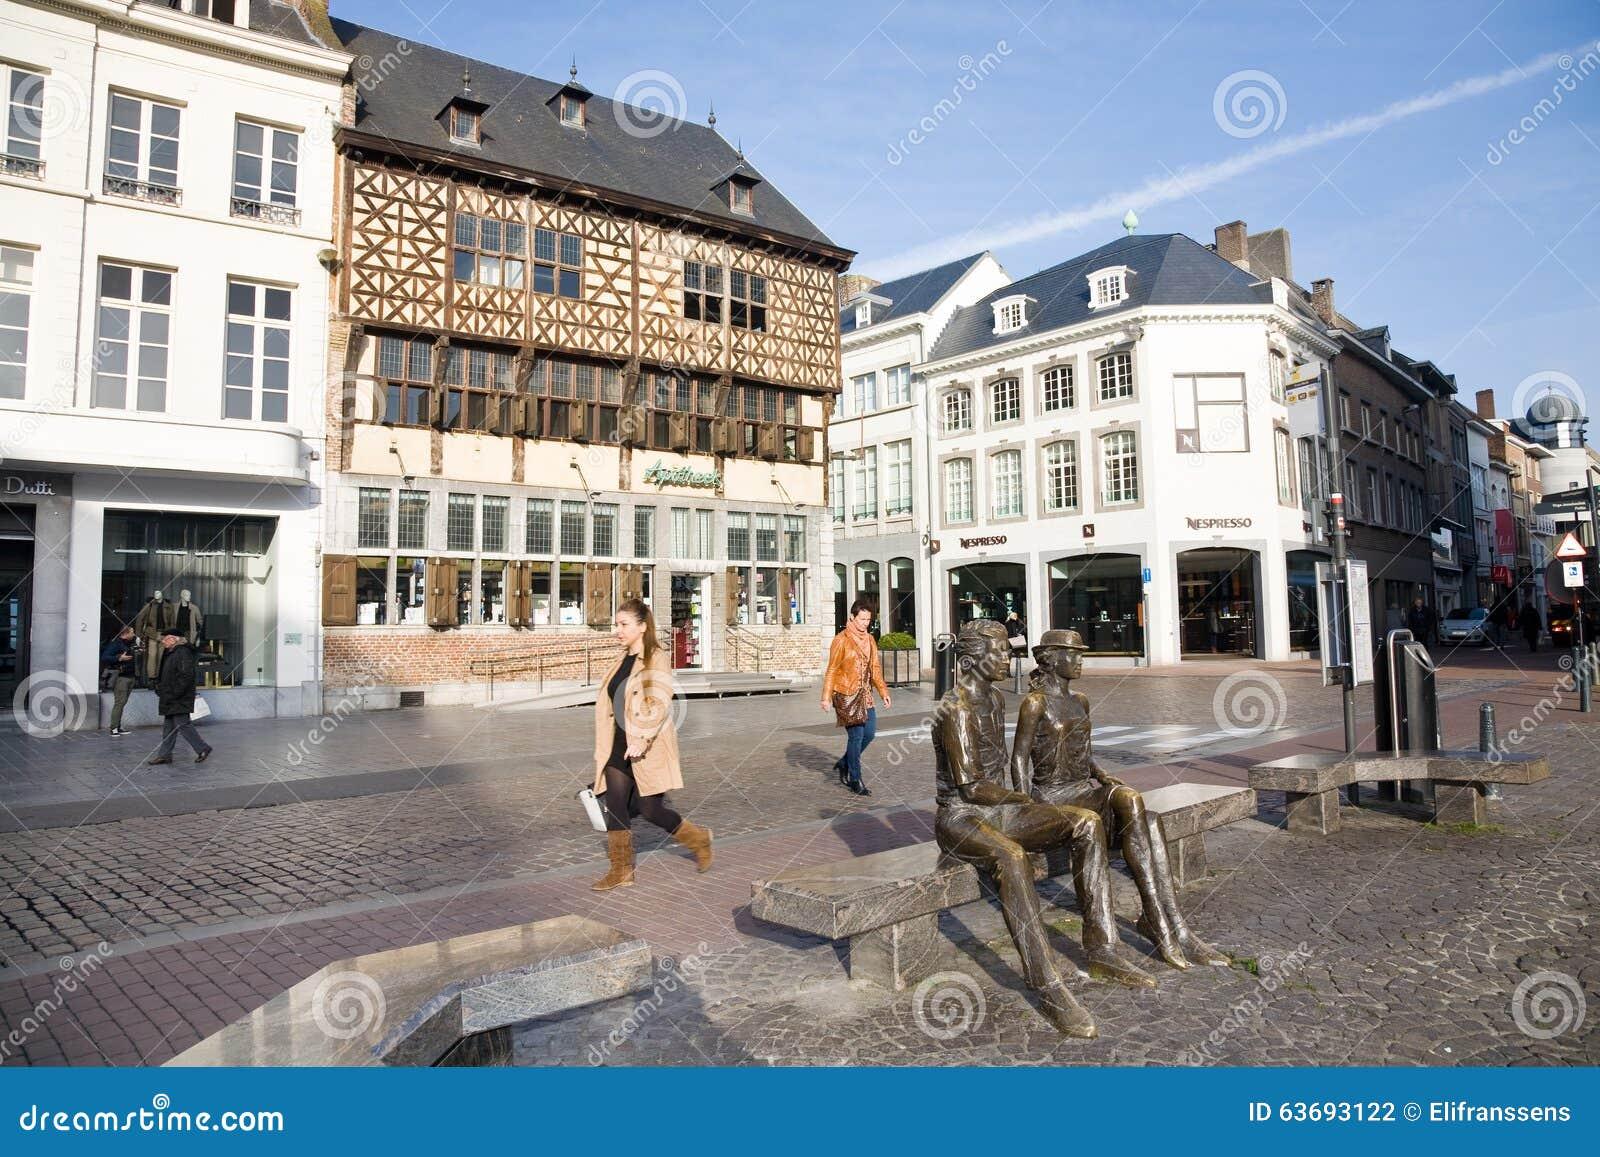 Quadrato principale, Hasselt, Belgio